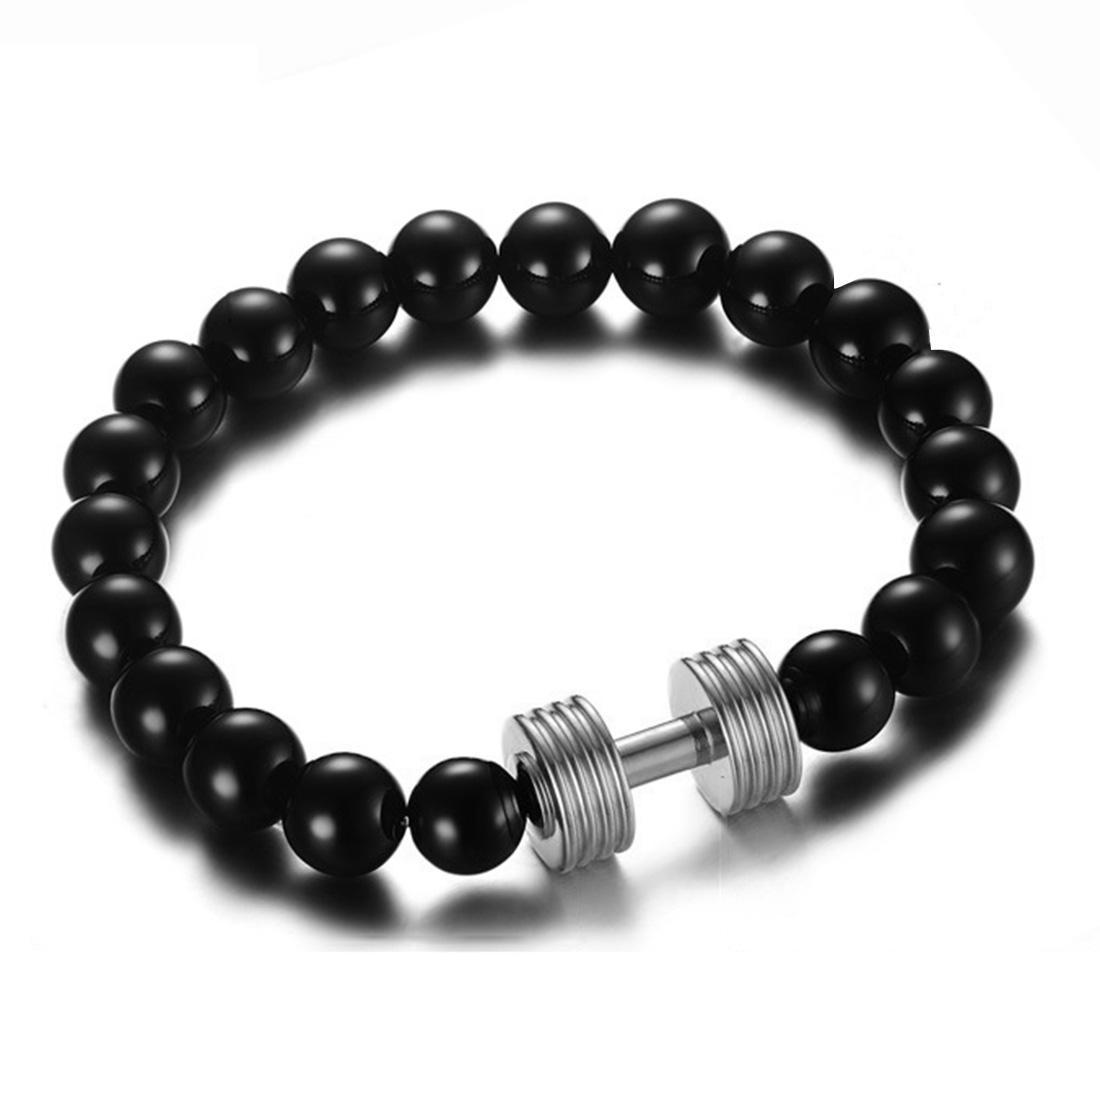 Mens Womens Schwarz Achat Perlen Armband Barbell Charm Elastic Armband Gym Schmuck Gold